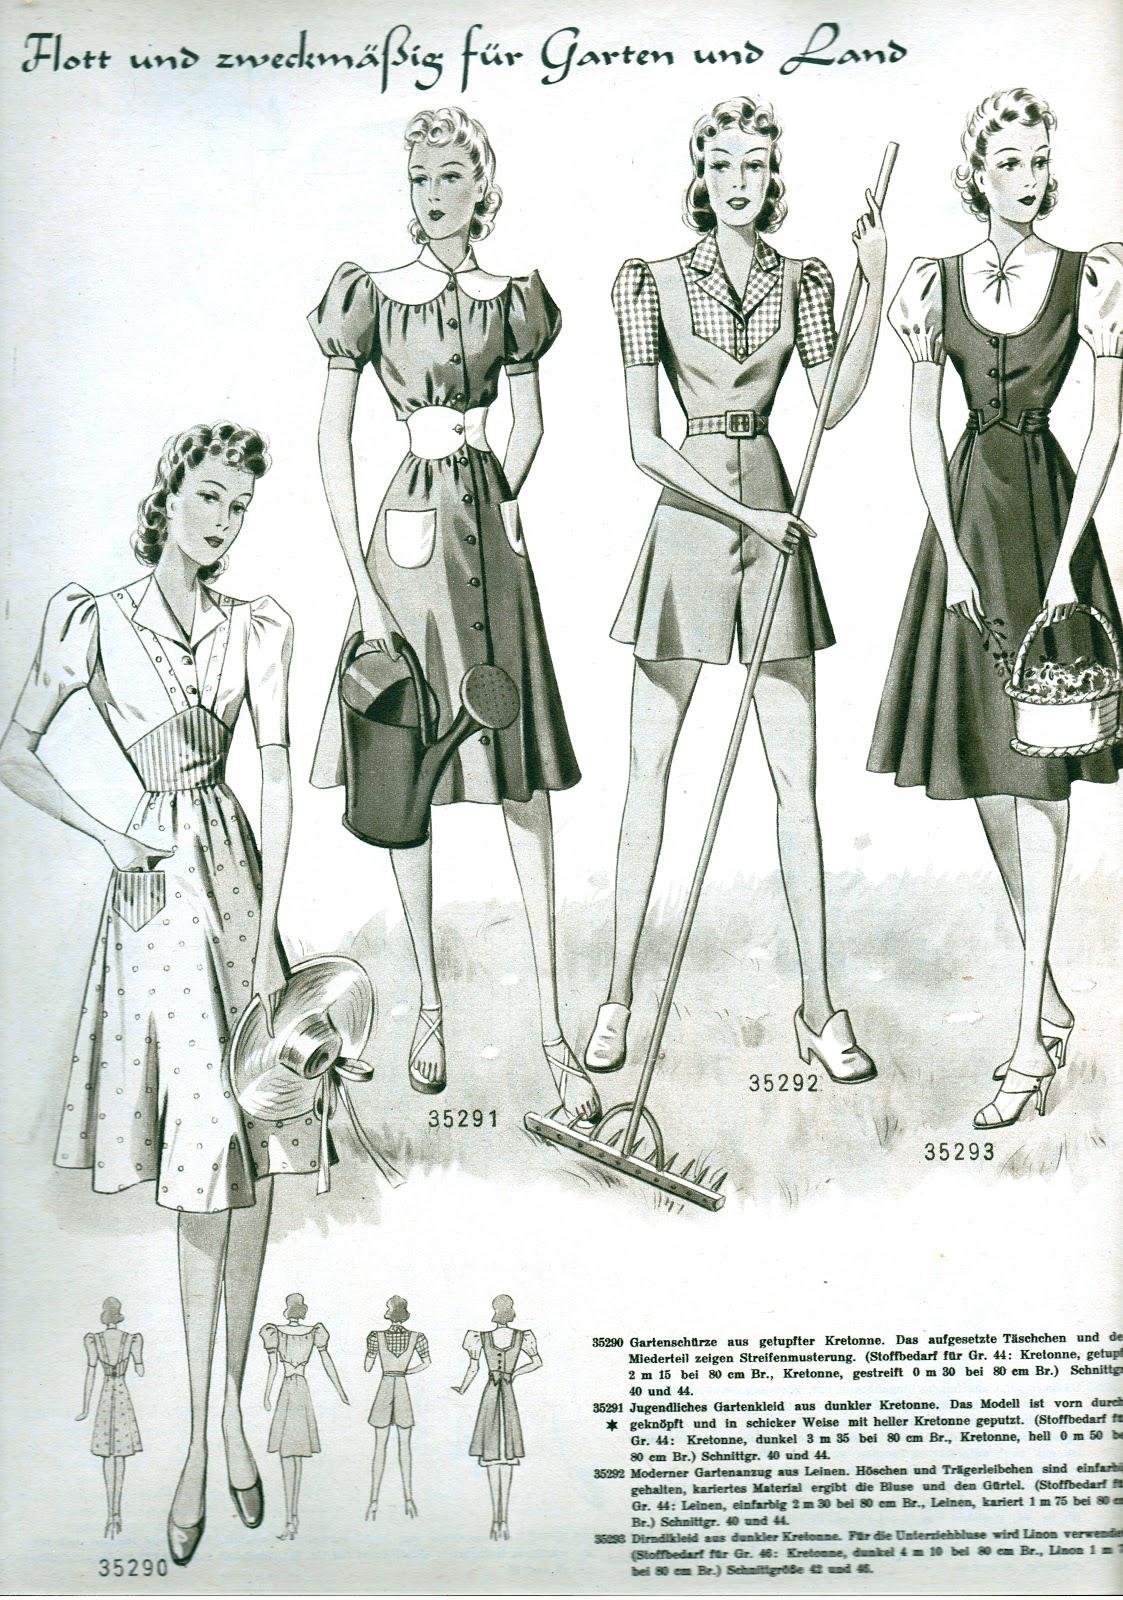 Sew Something Vintage 1940s Fashion: Sew Something Vintage: 1940s Inspiration